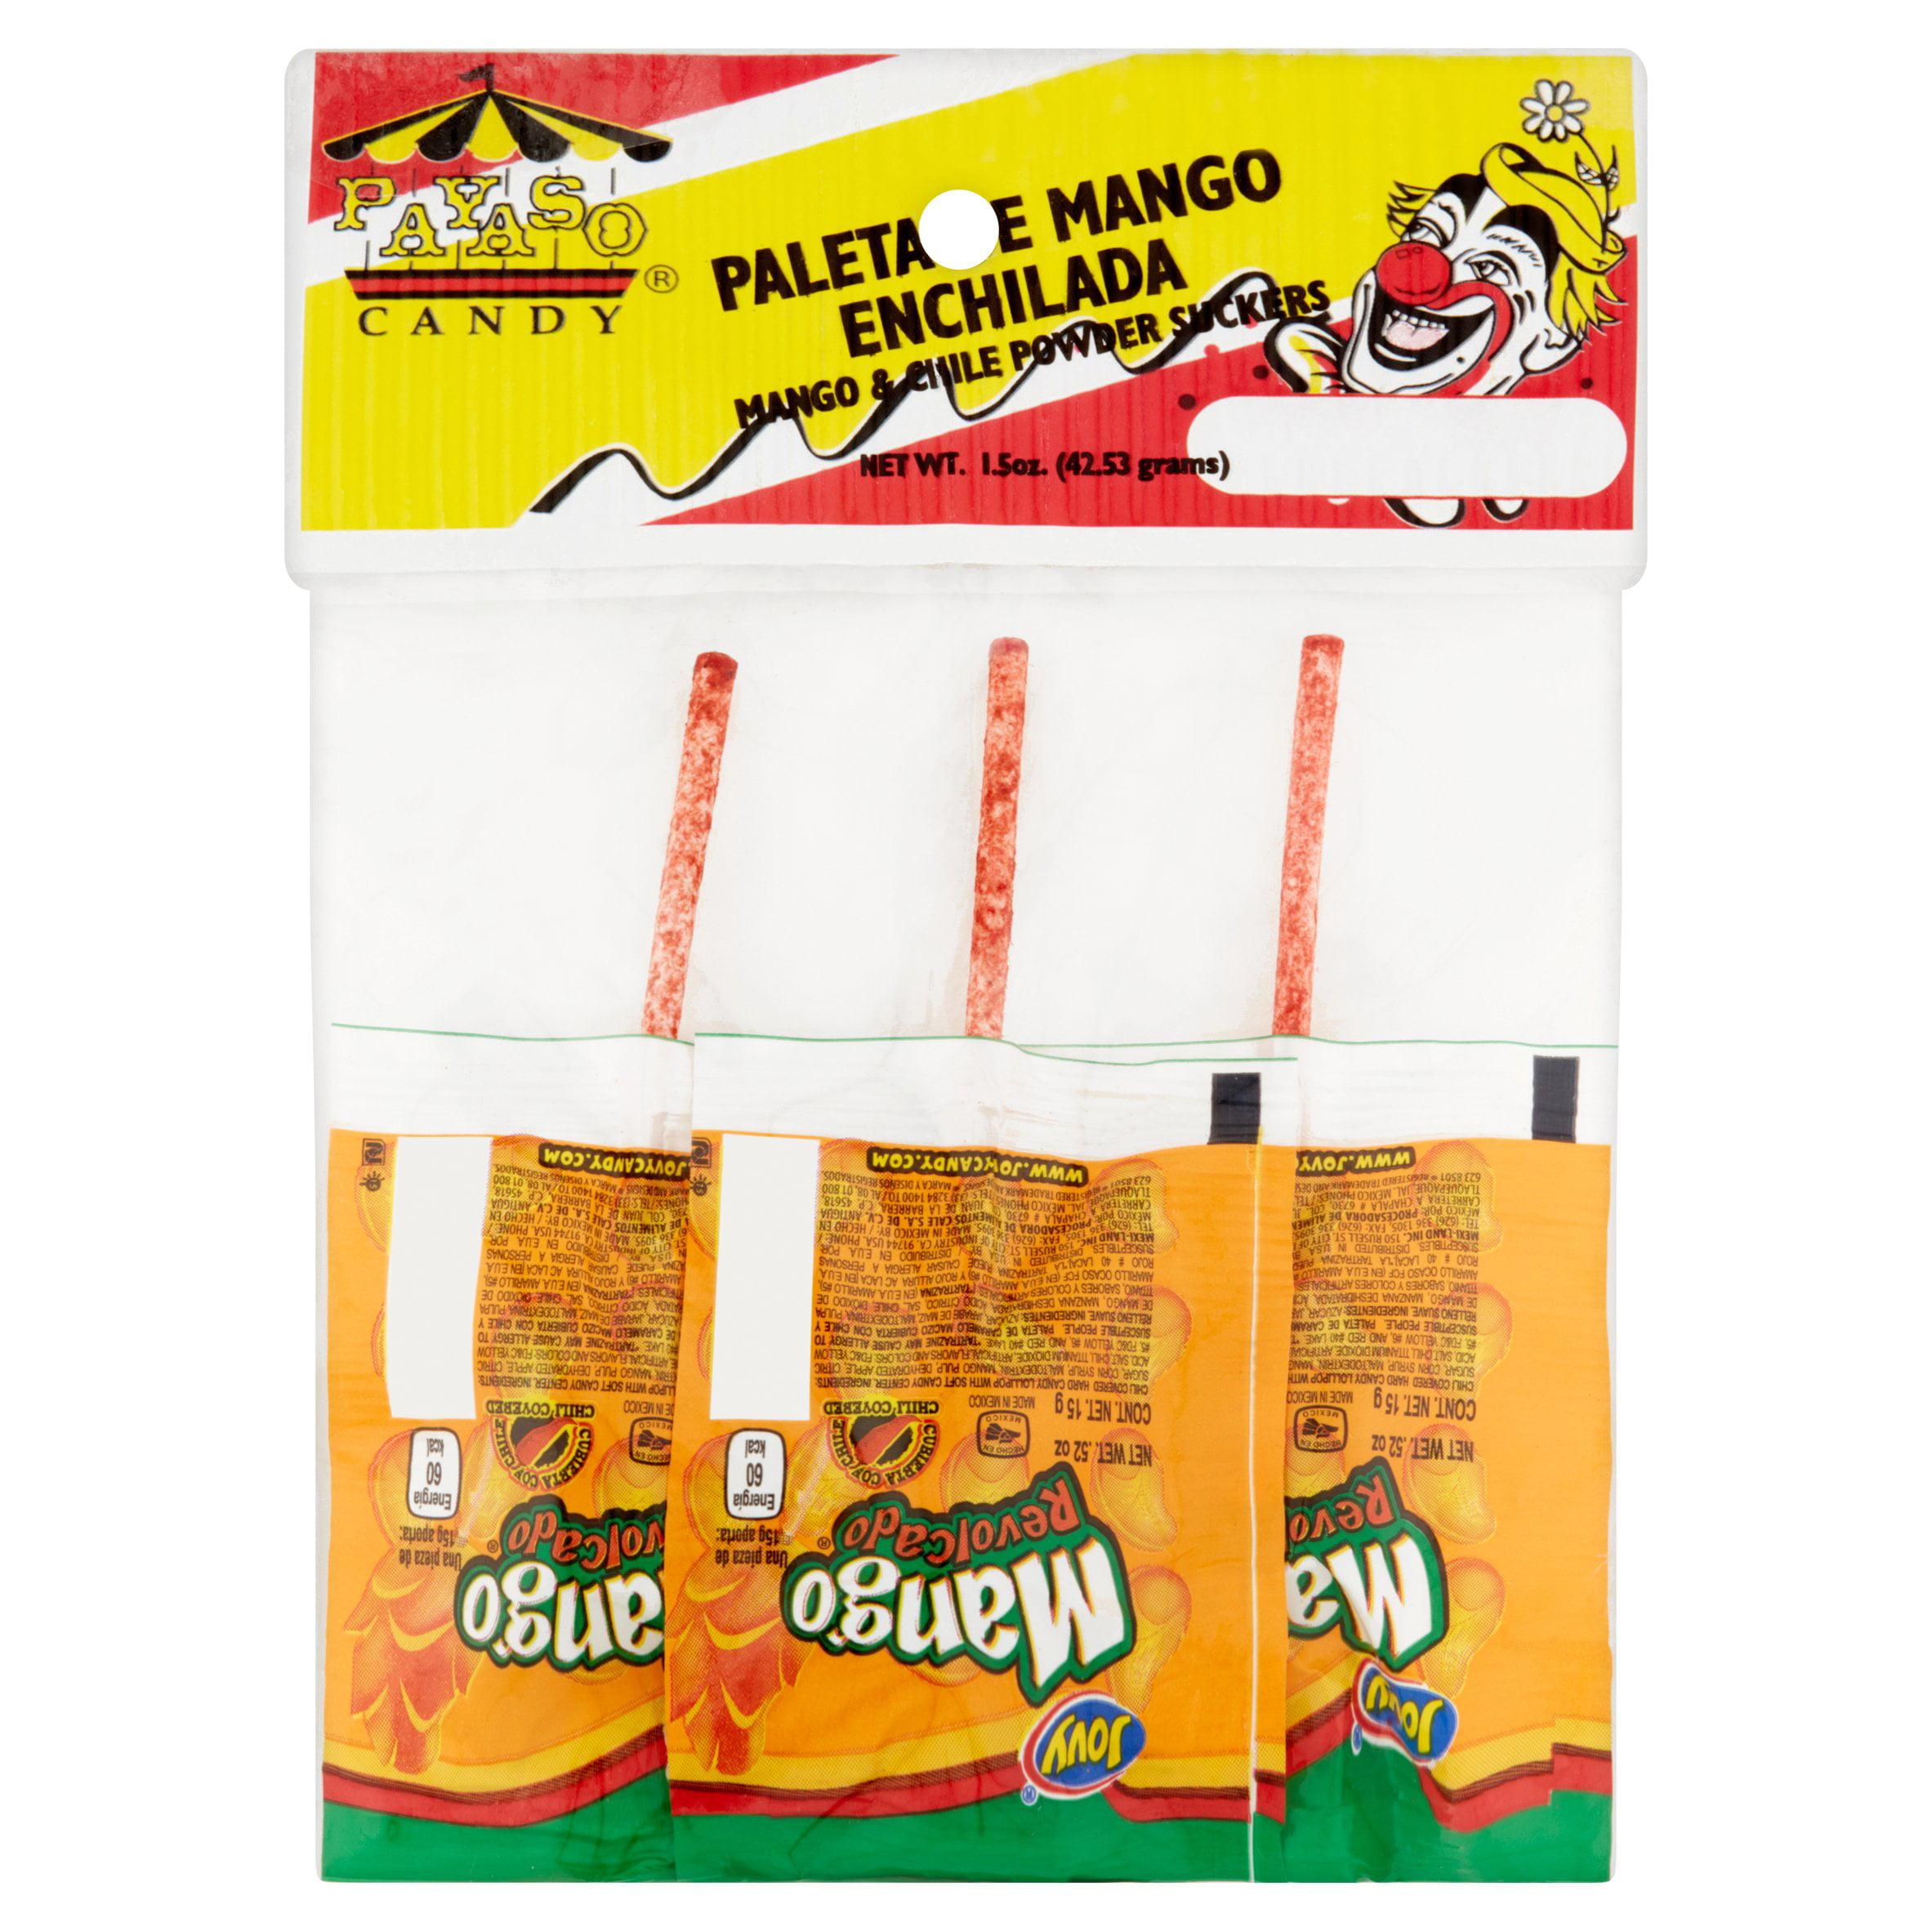 (3 Pack) Payaso Mango & Chile Powder Suckers Candy, 1.5 oz